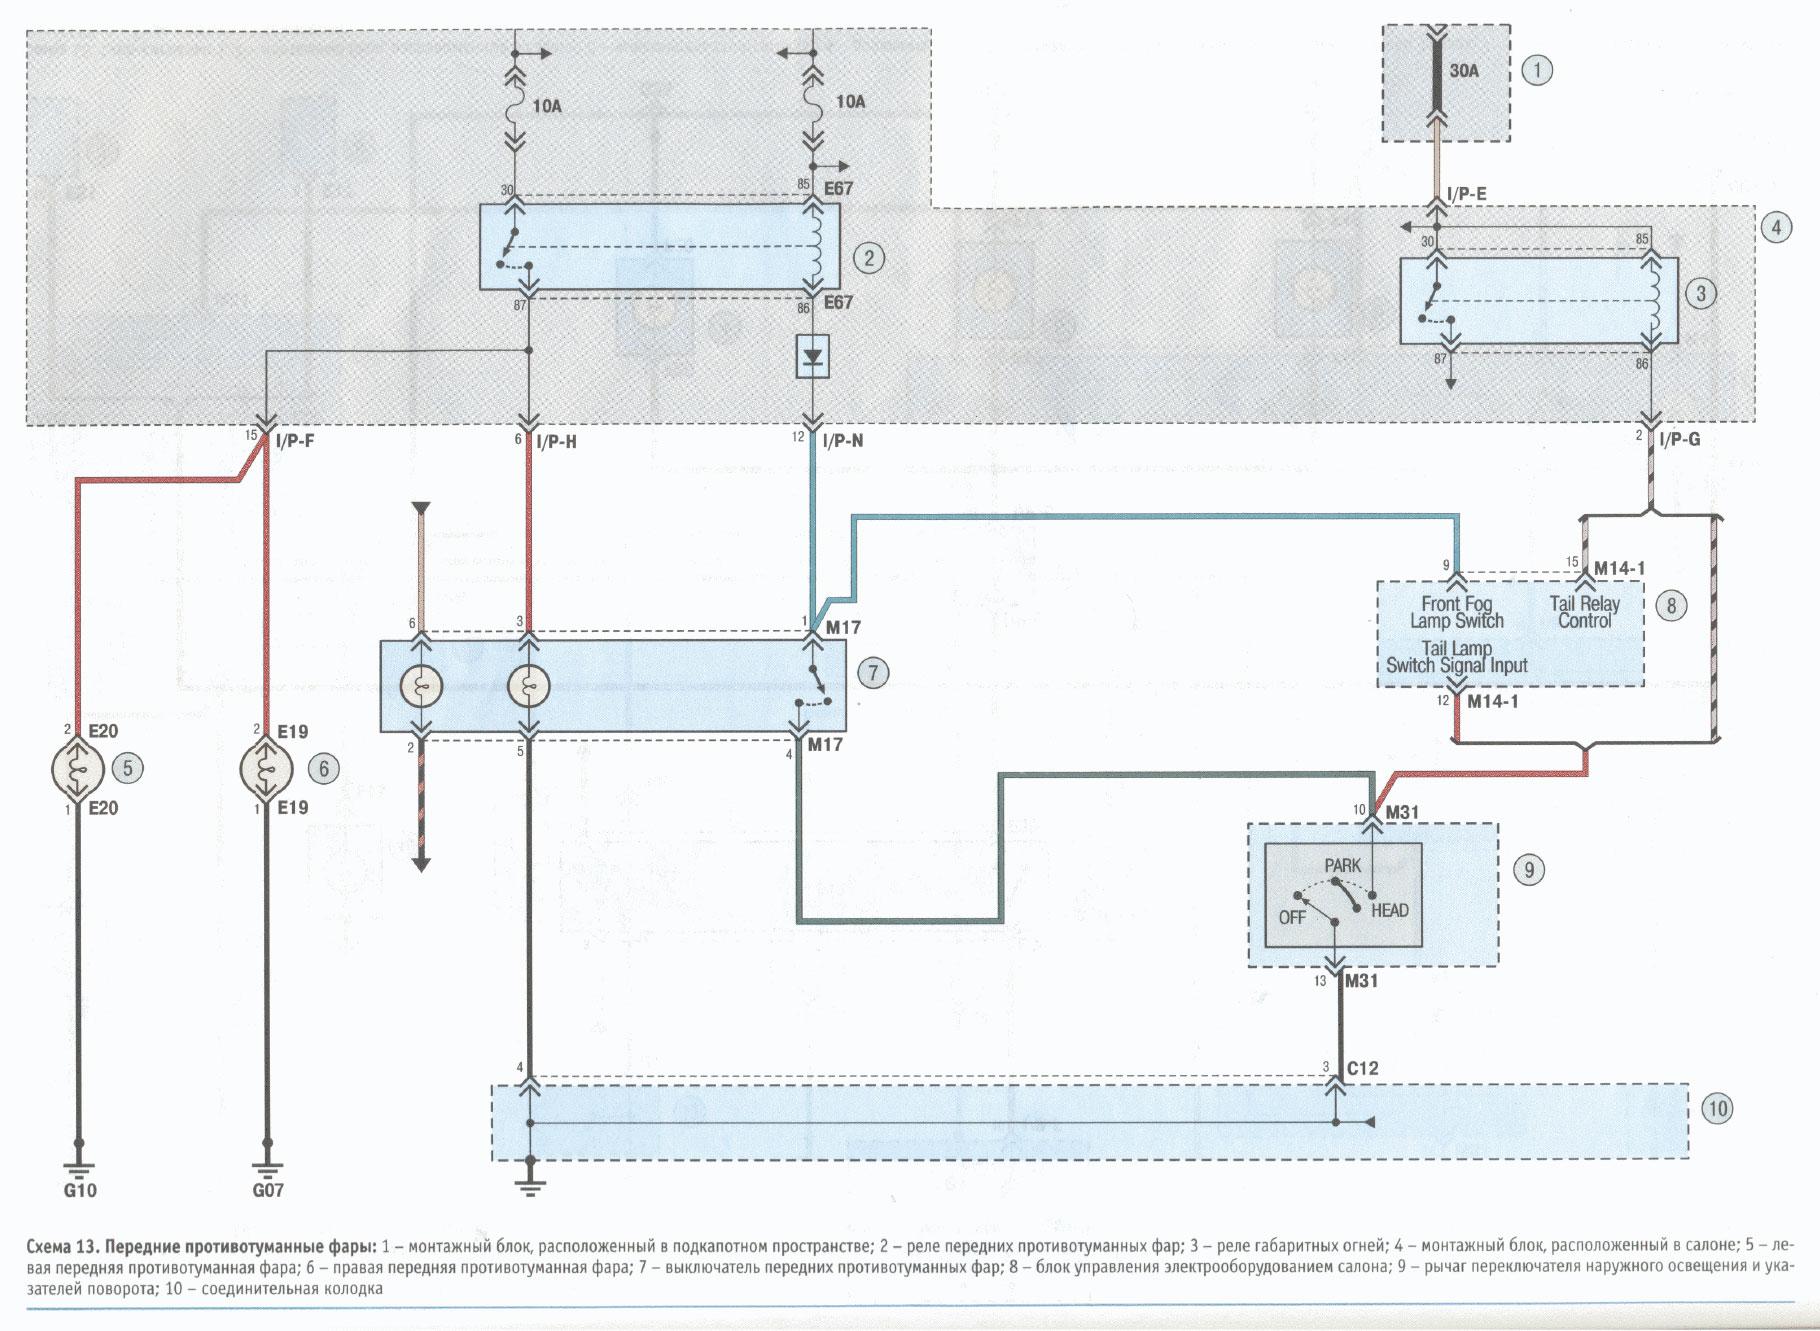 эл схема противотуманных фар